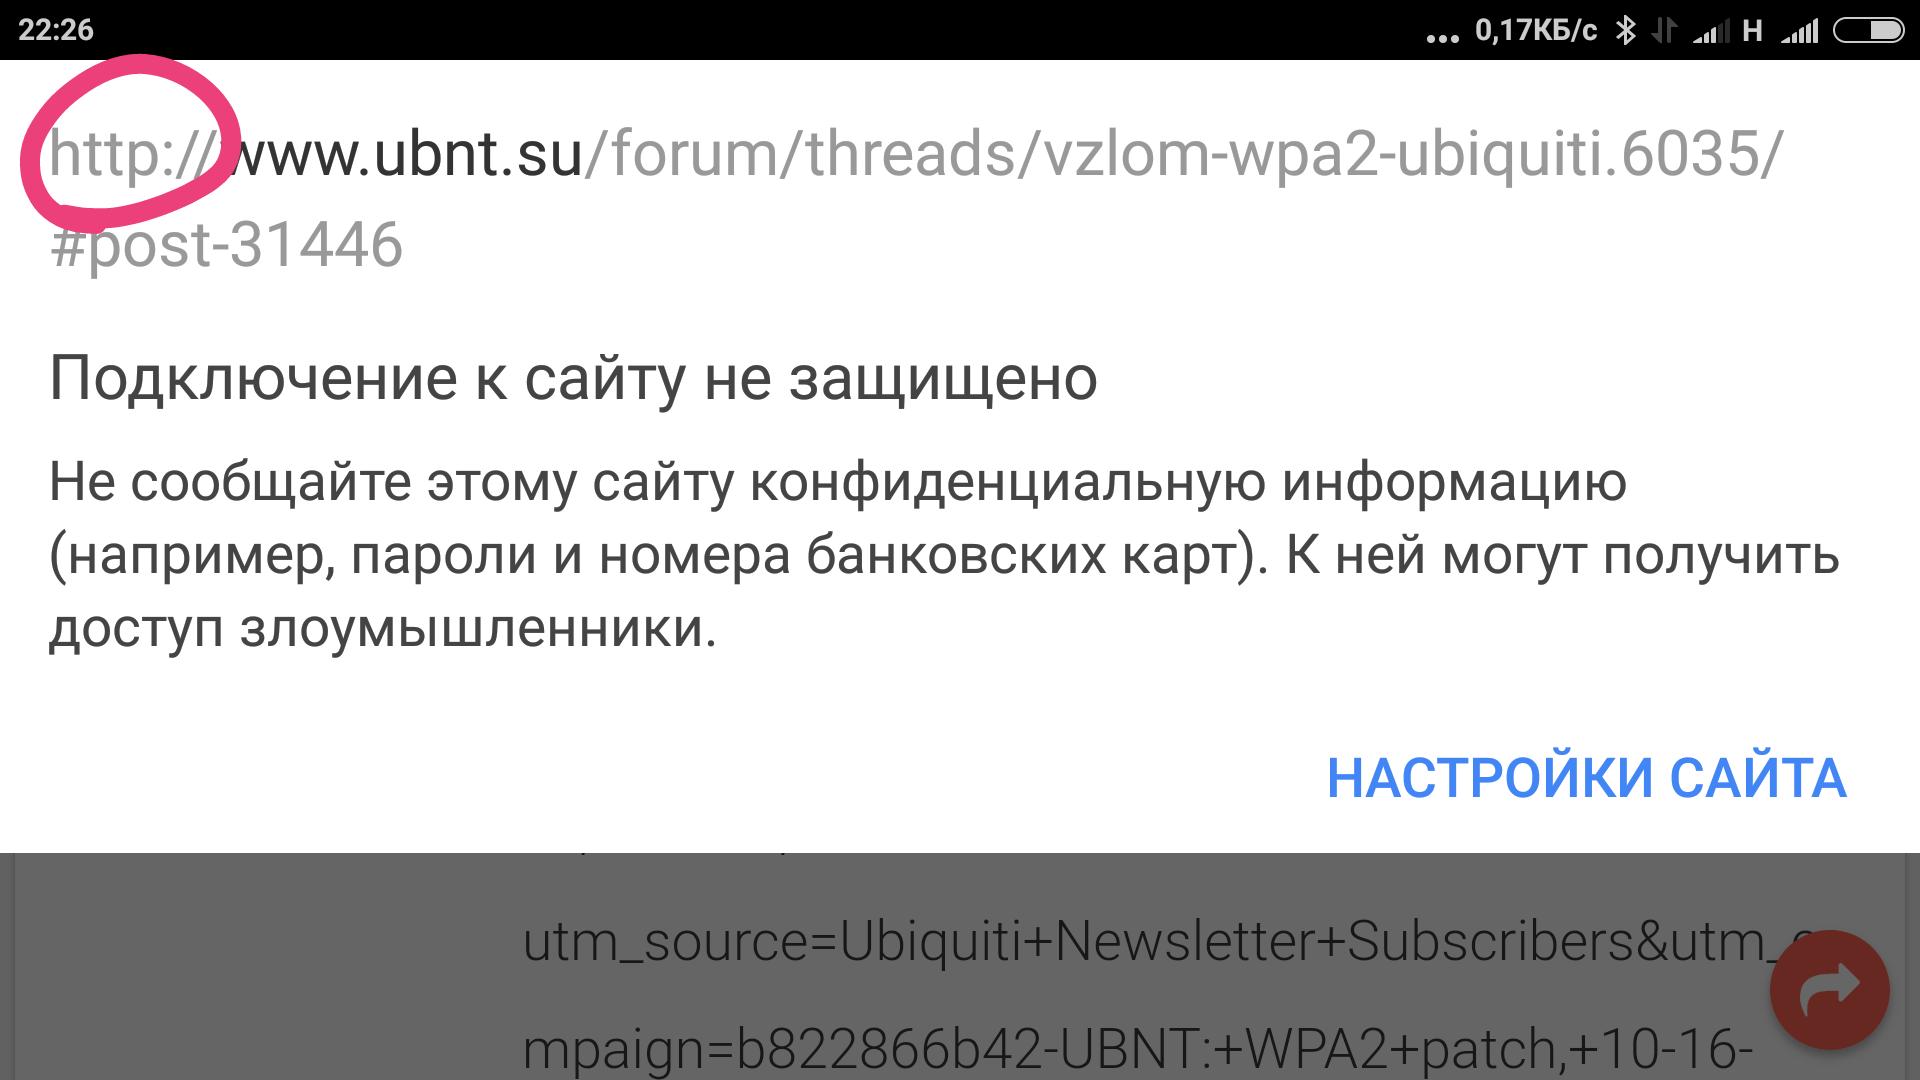 download4253f5b6_hots_2fScreenshot_2017-10-17-22-26-09-658_com.android.chrome.png